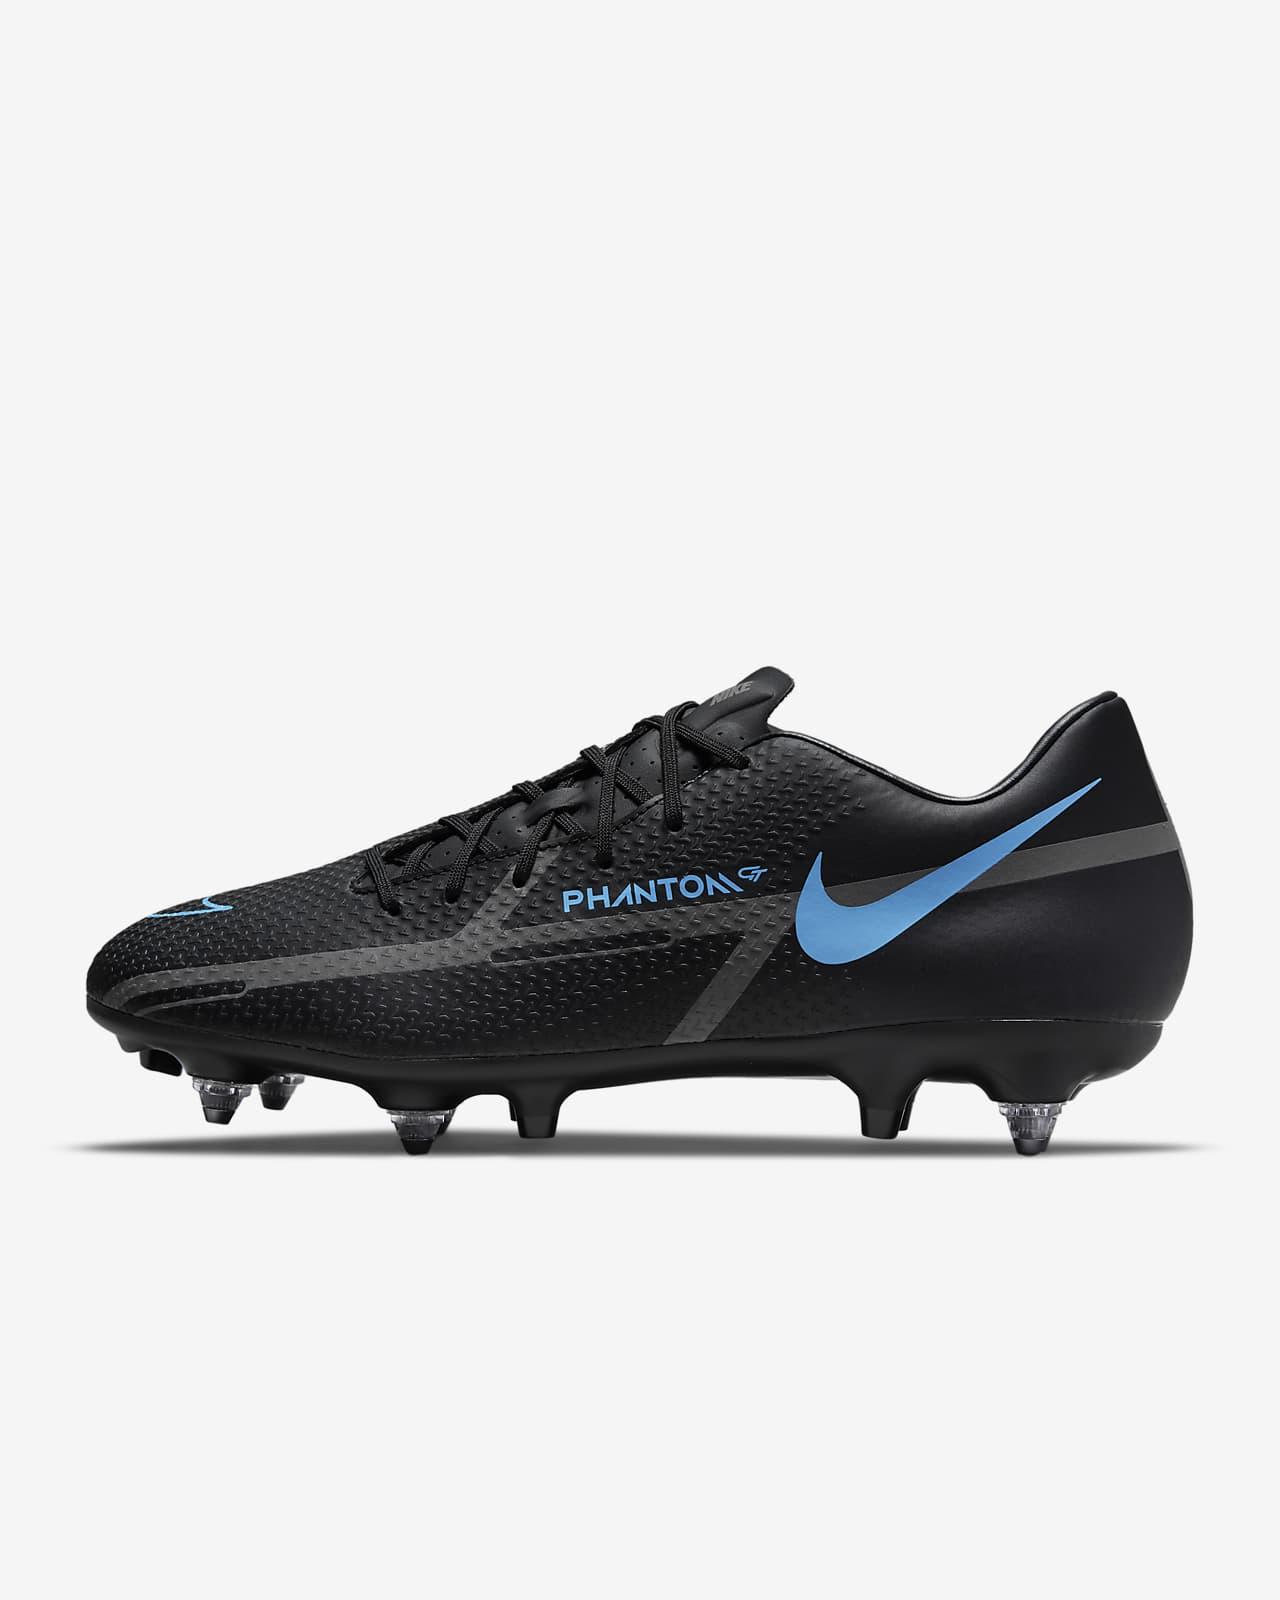 Nike Phantom GT2 Academy SG-Pro AC Soft-Ground Football Boot